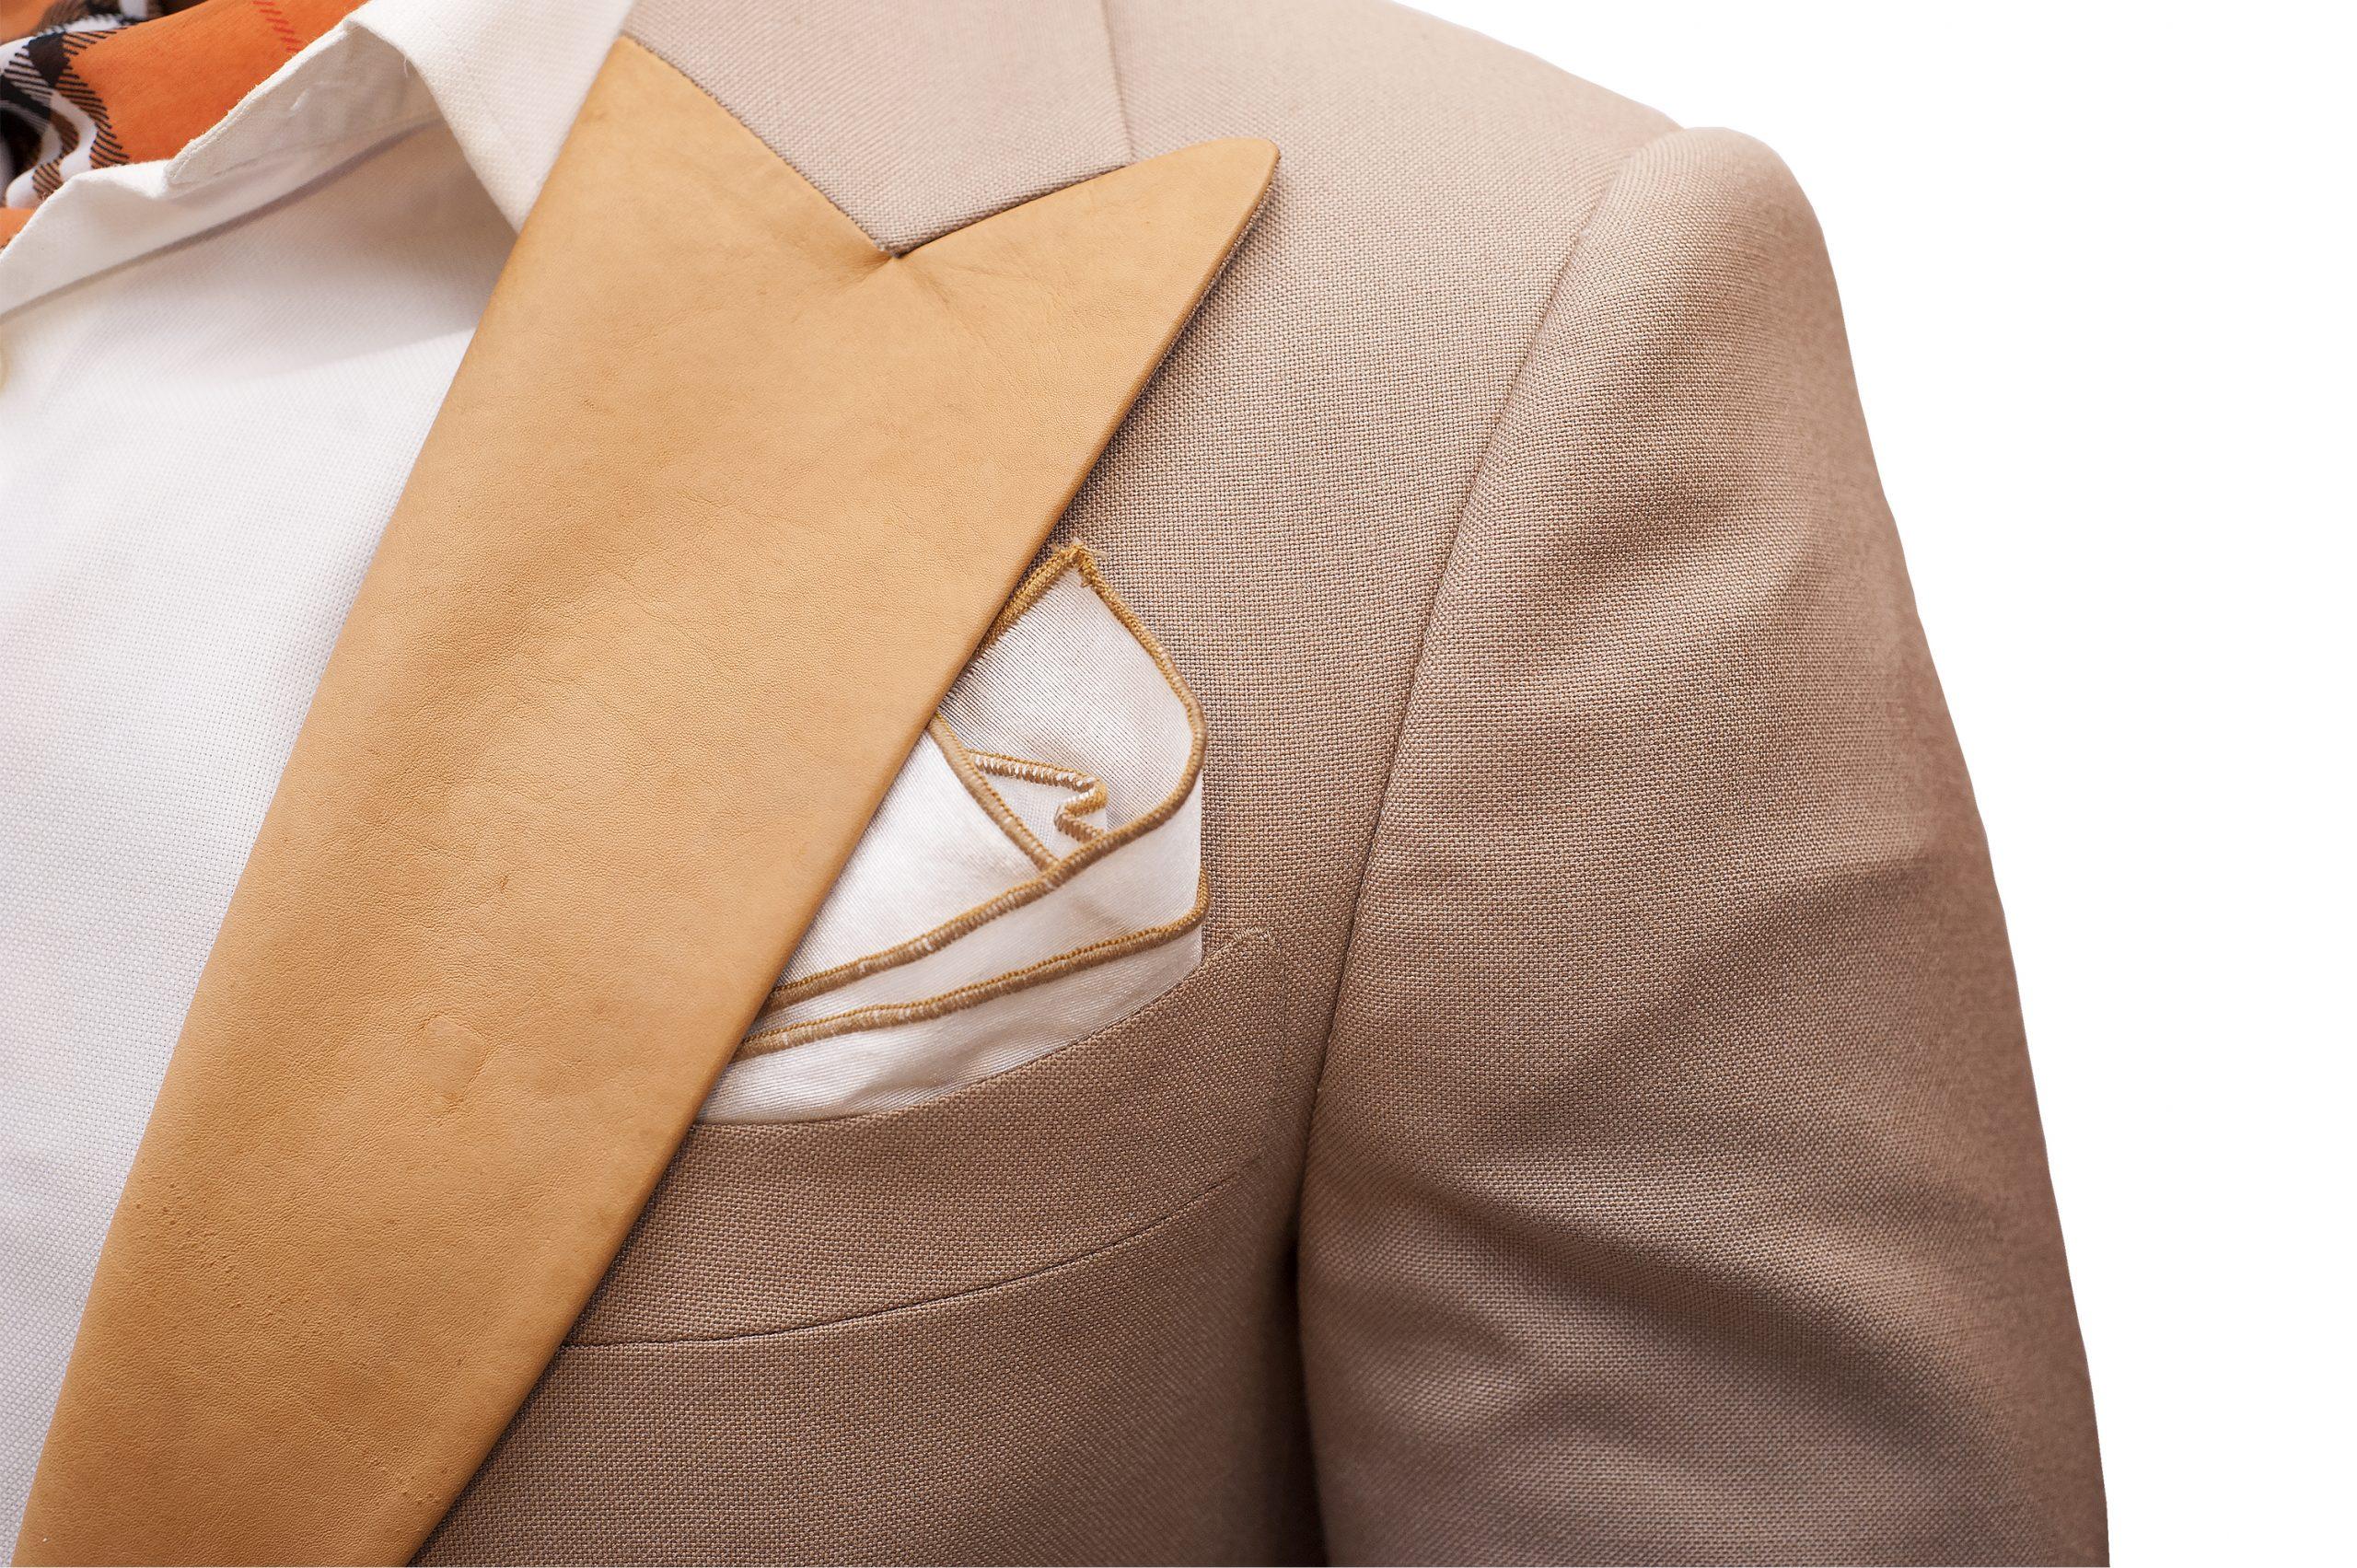 Leather lapel unique beige wedding tuxedo Nairobi Kenya